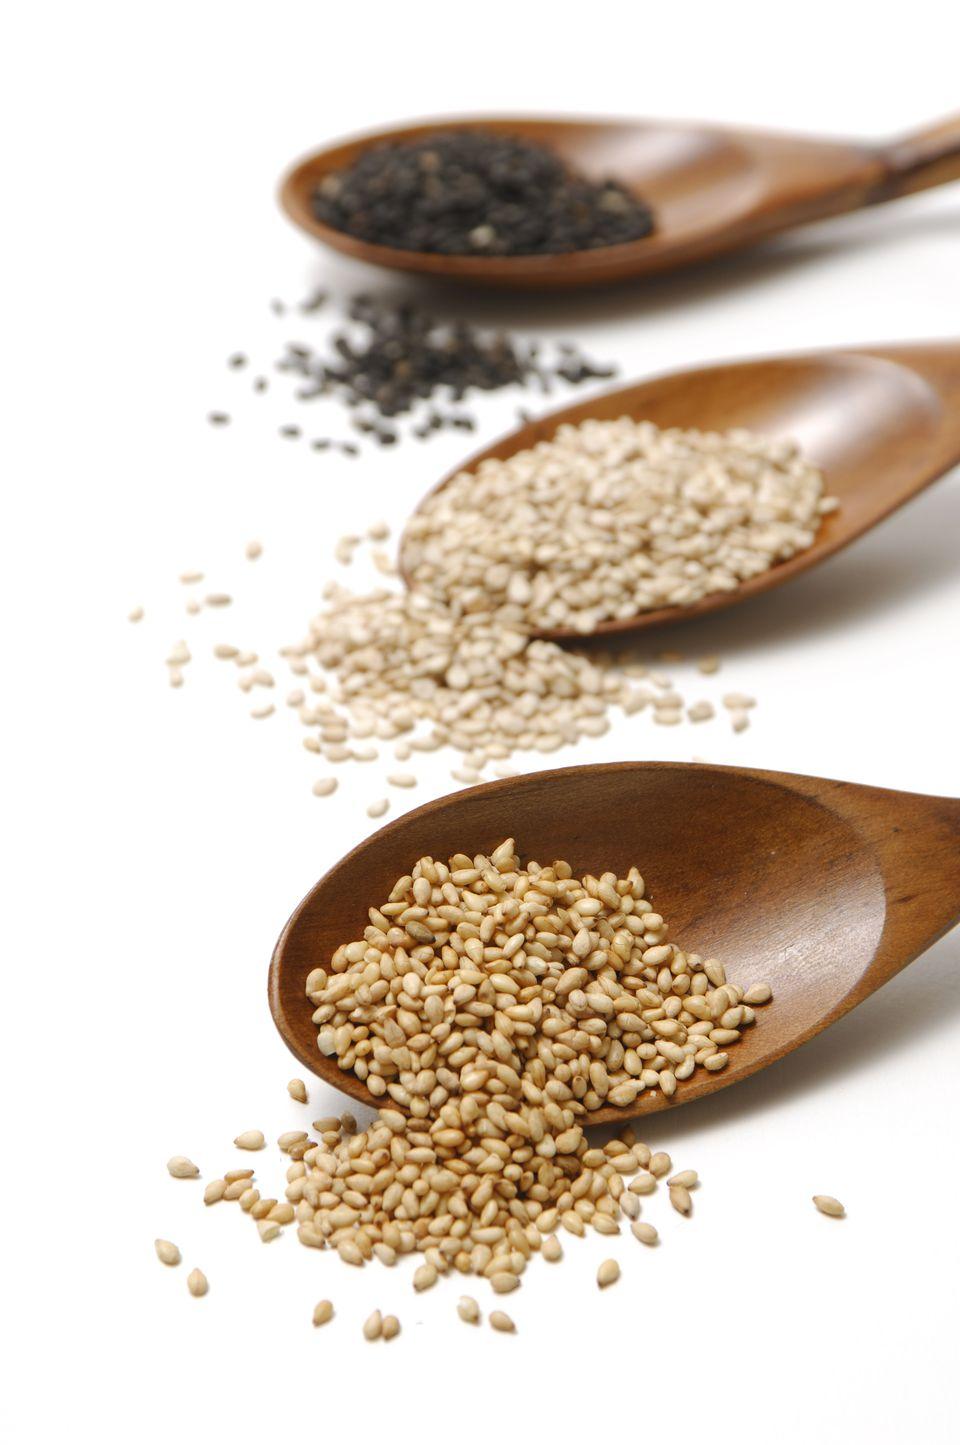 Three Sorts of Sesame Seeds